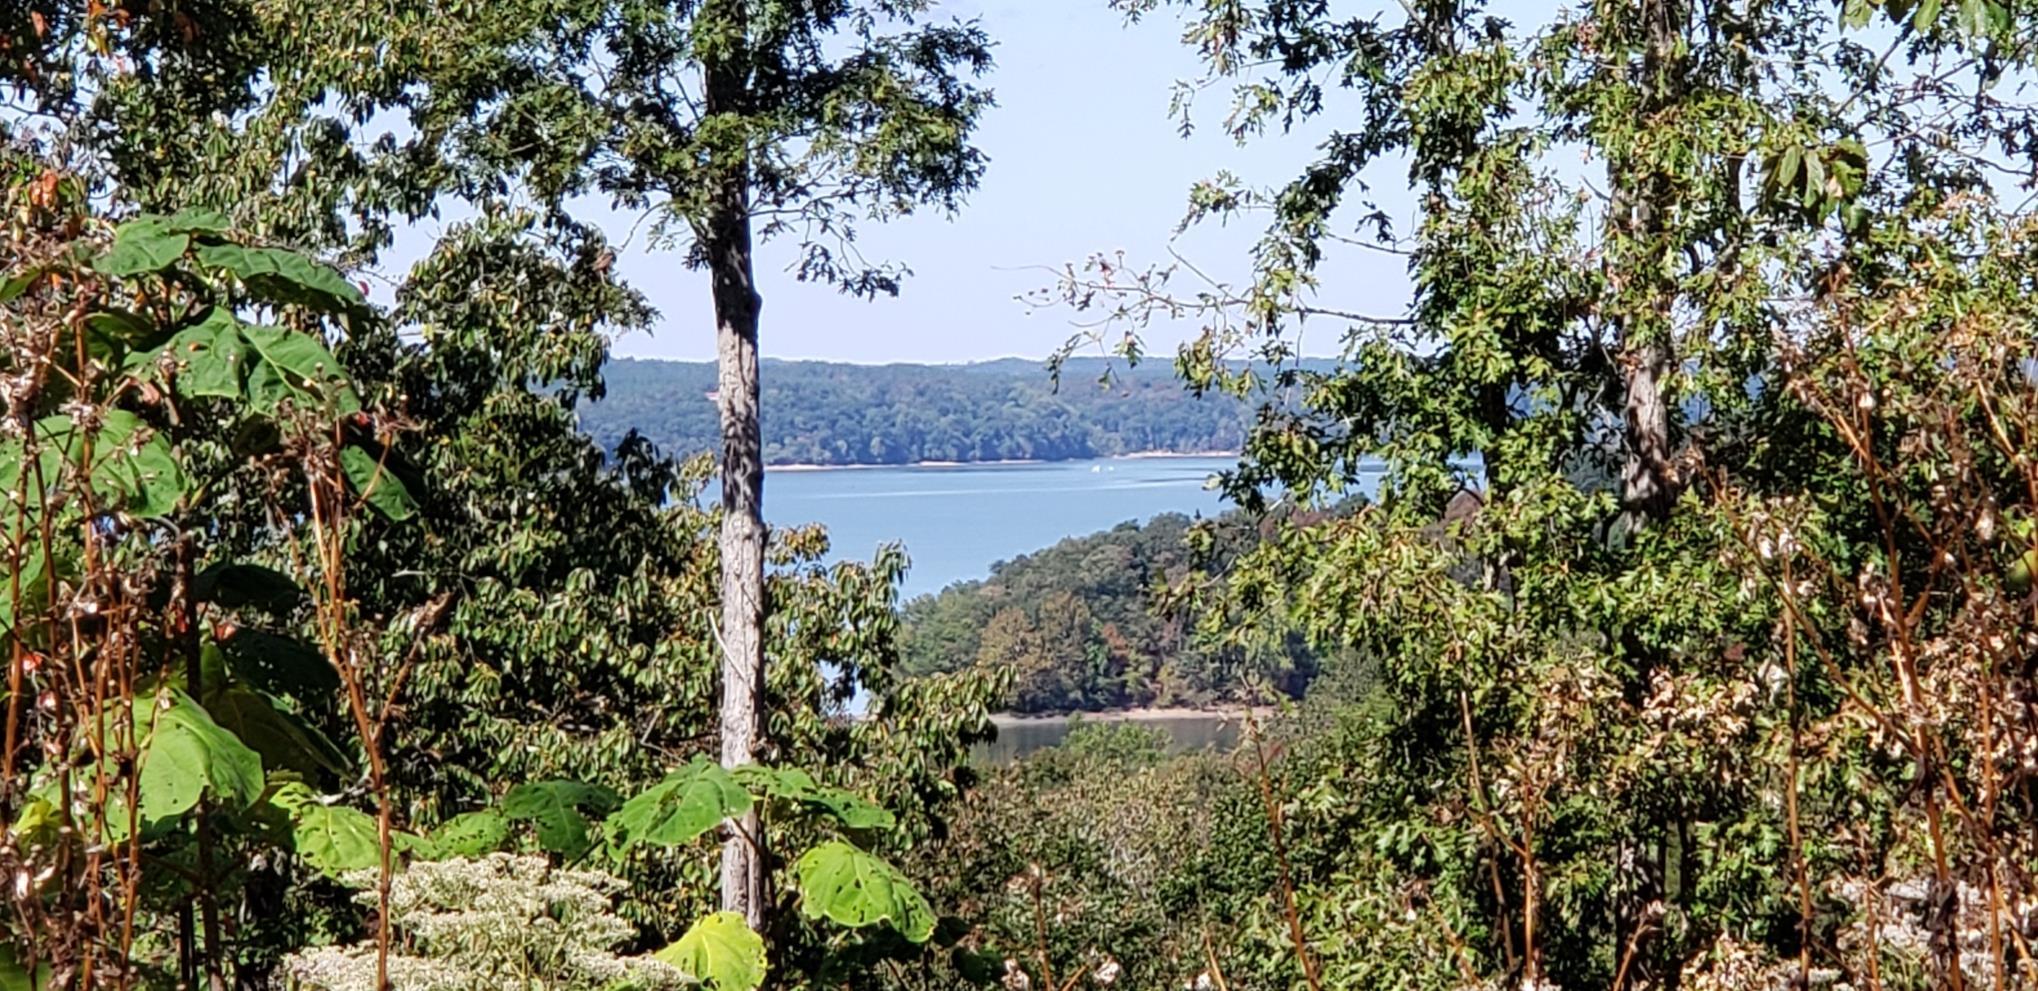 0 Crestwood Dr, Waverly, TN 37185 - Waverly, TN real estate listing